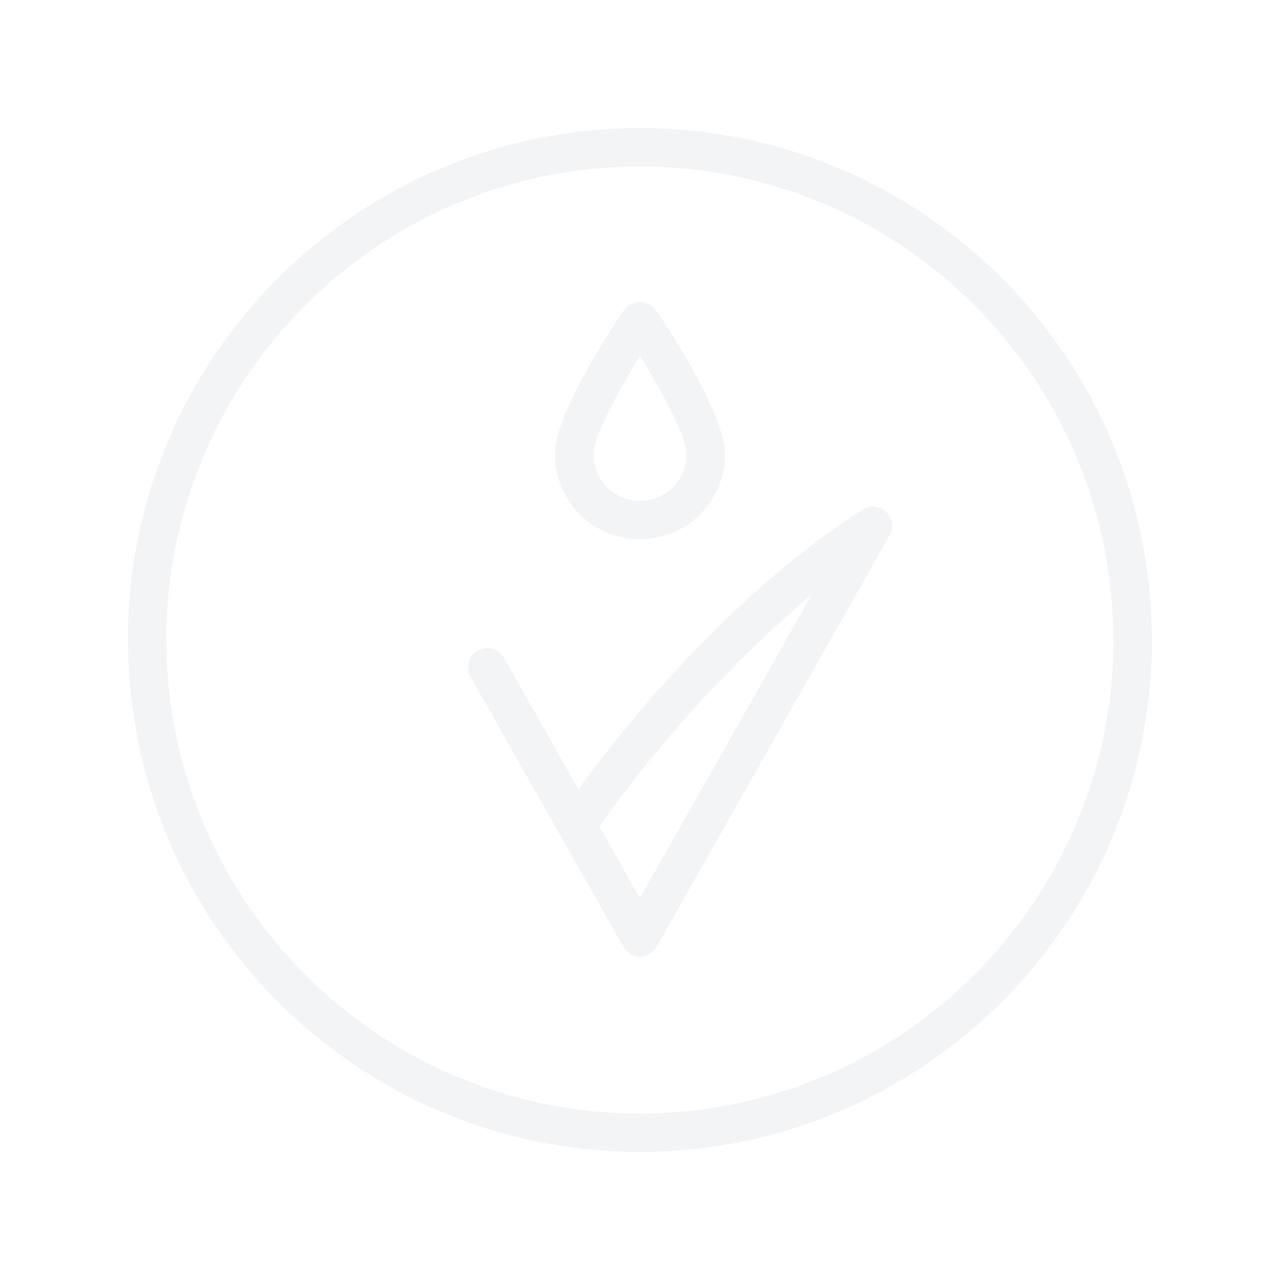 IDUN Minerals baaspuuder 9g